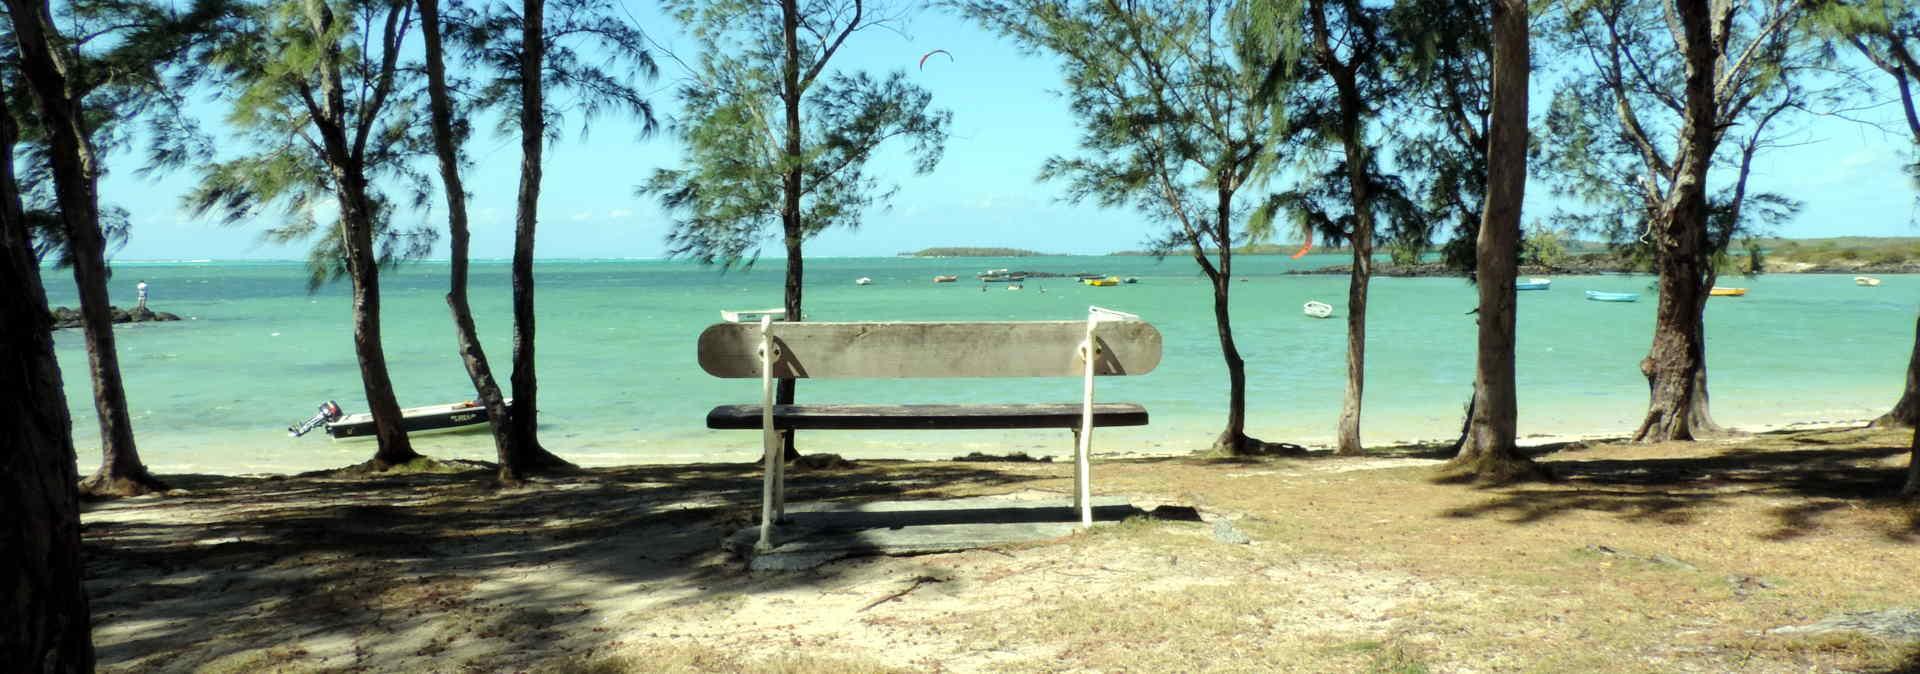 Lagoon of Mauritius